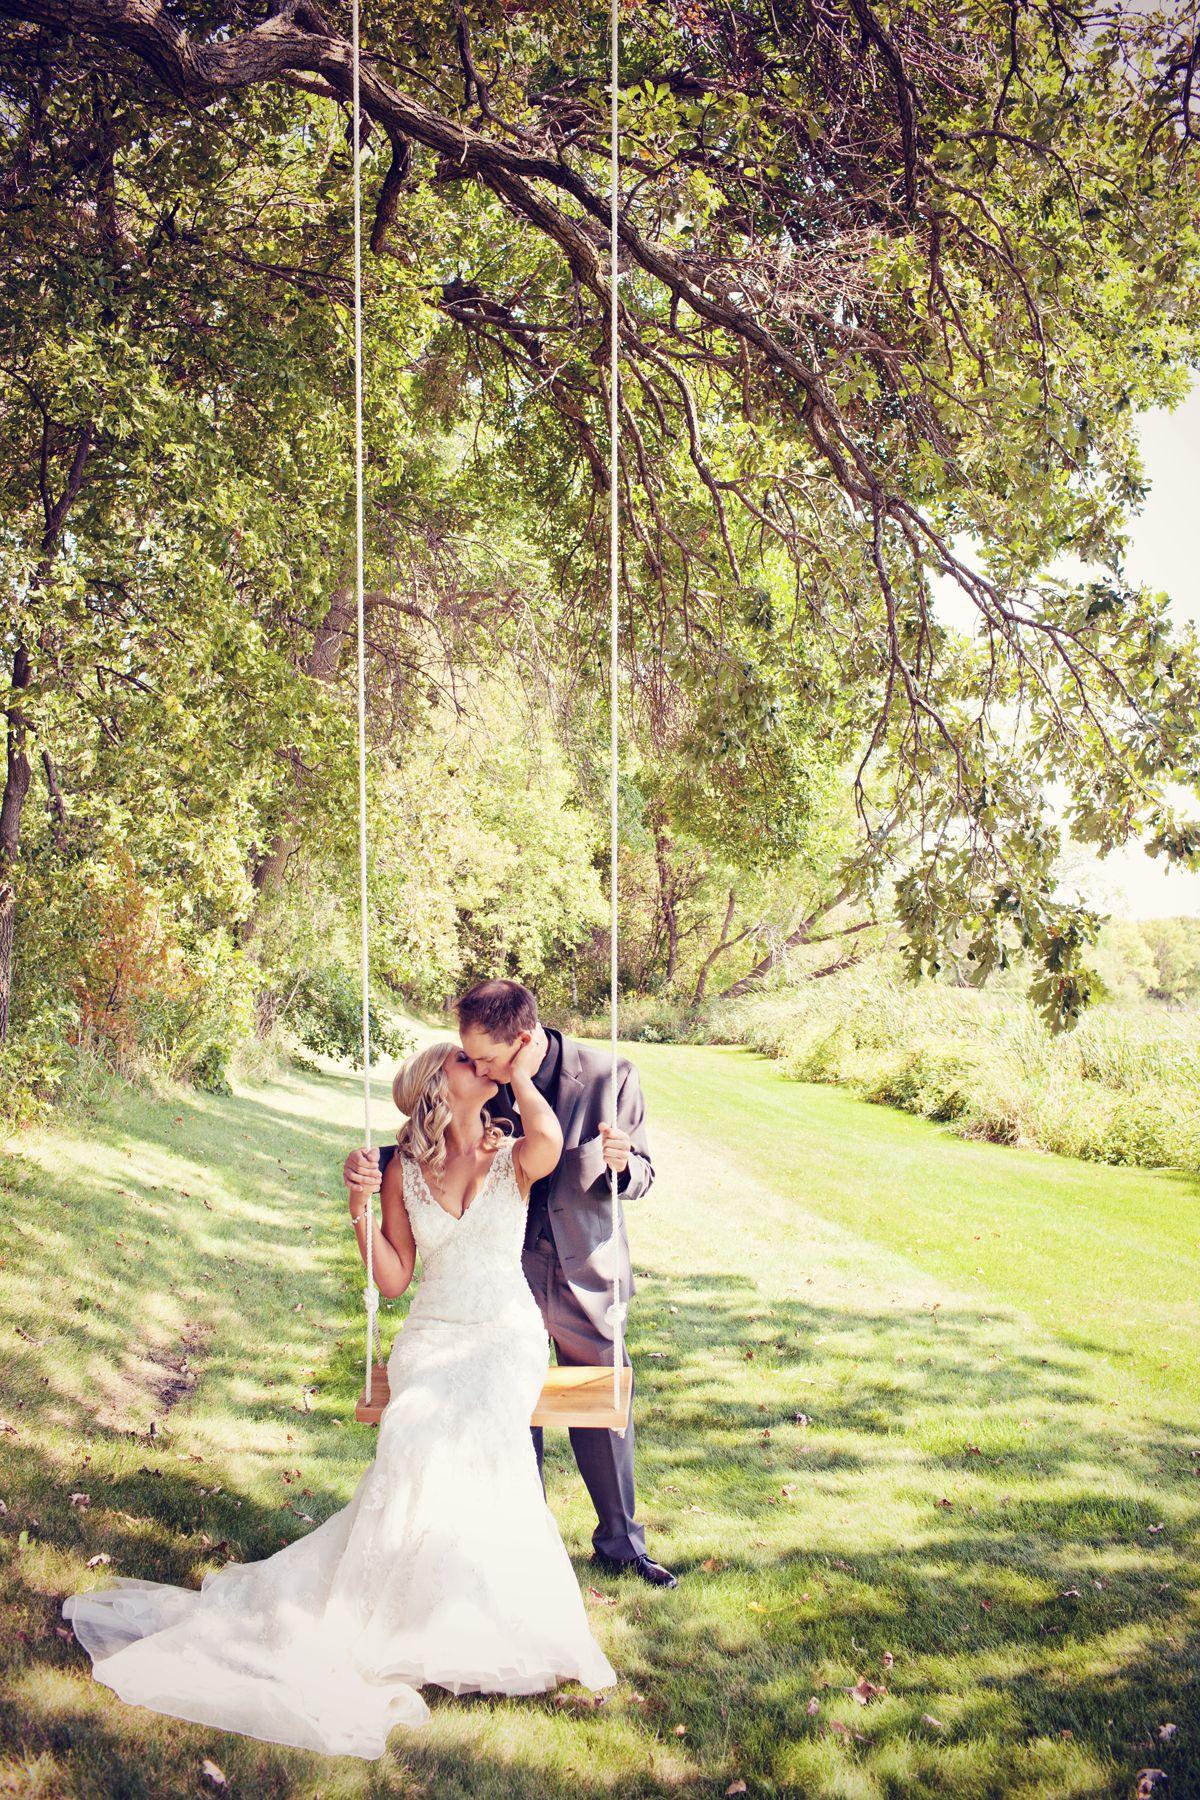 Minneapolis Wedding Photographer Wedding Photographers Wedding Photography Swing Pictures Wedding Swing Wedding Photographers